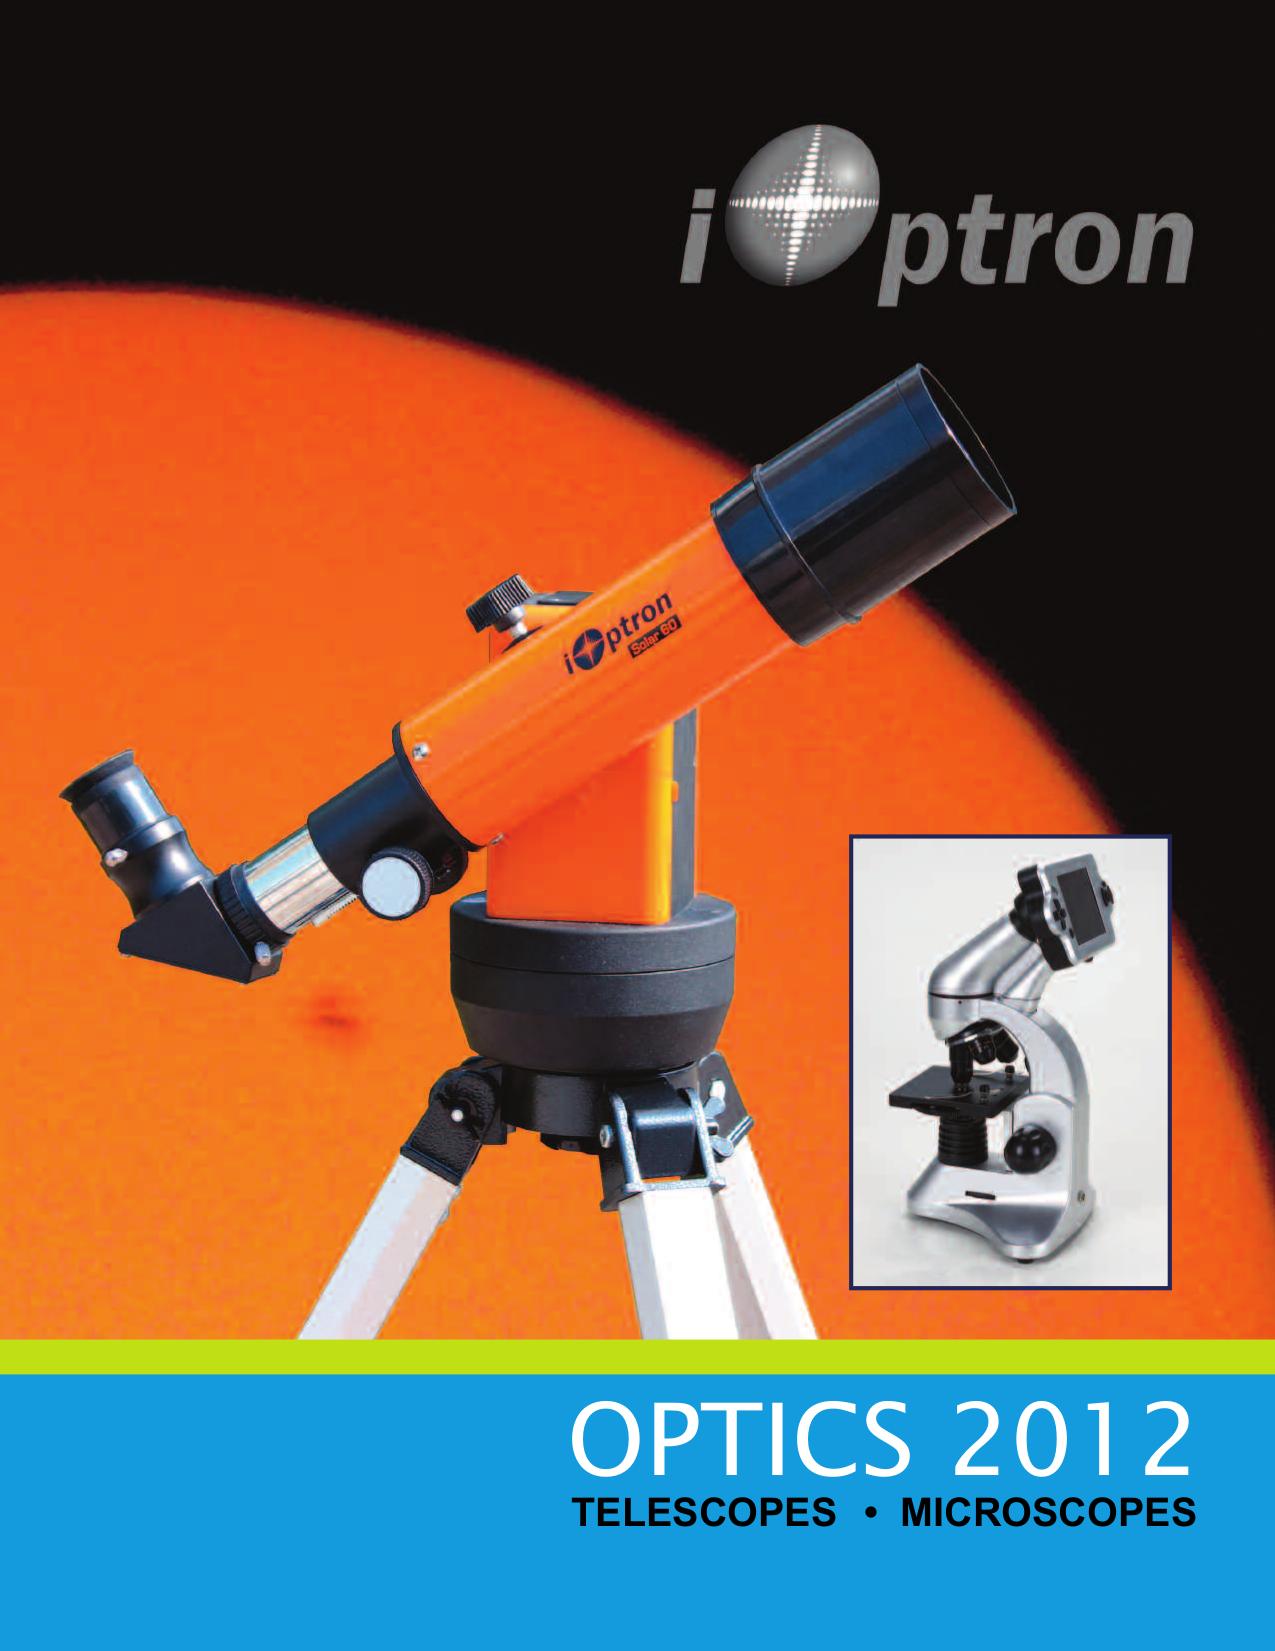 pdf for Ioptron Telescope SmartStar G-R80 manual